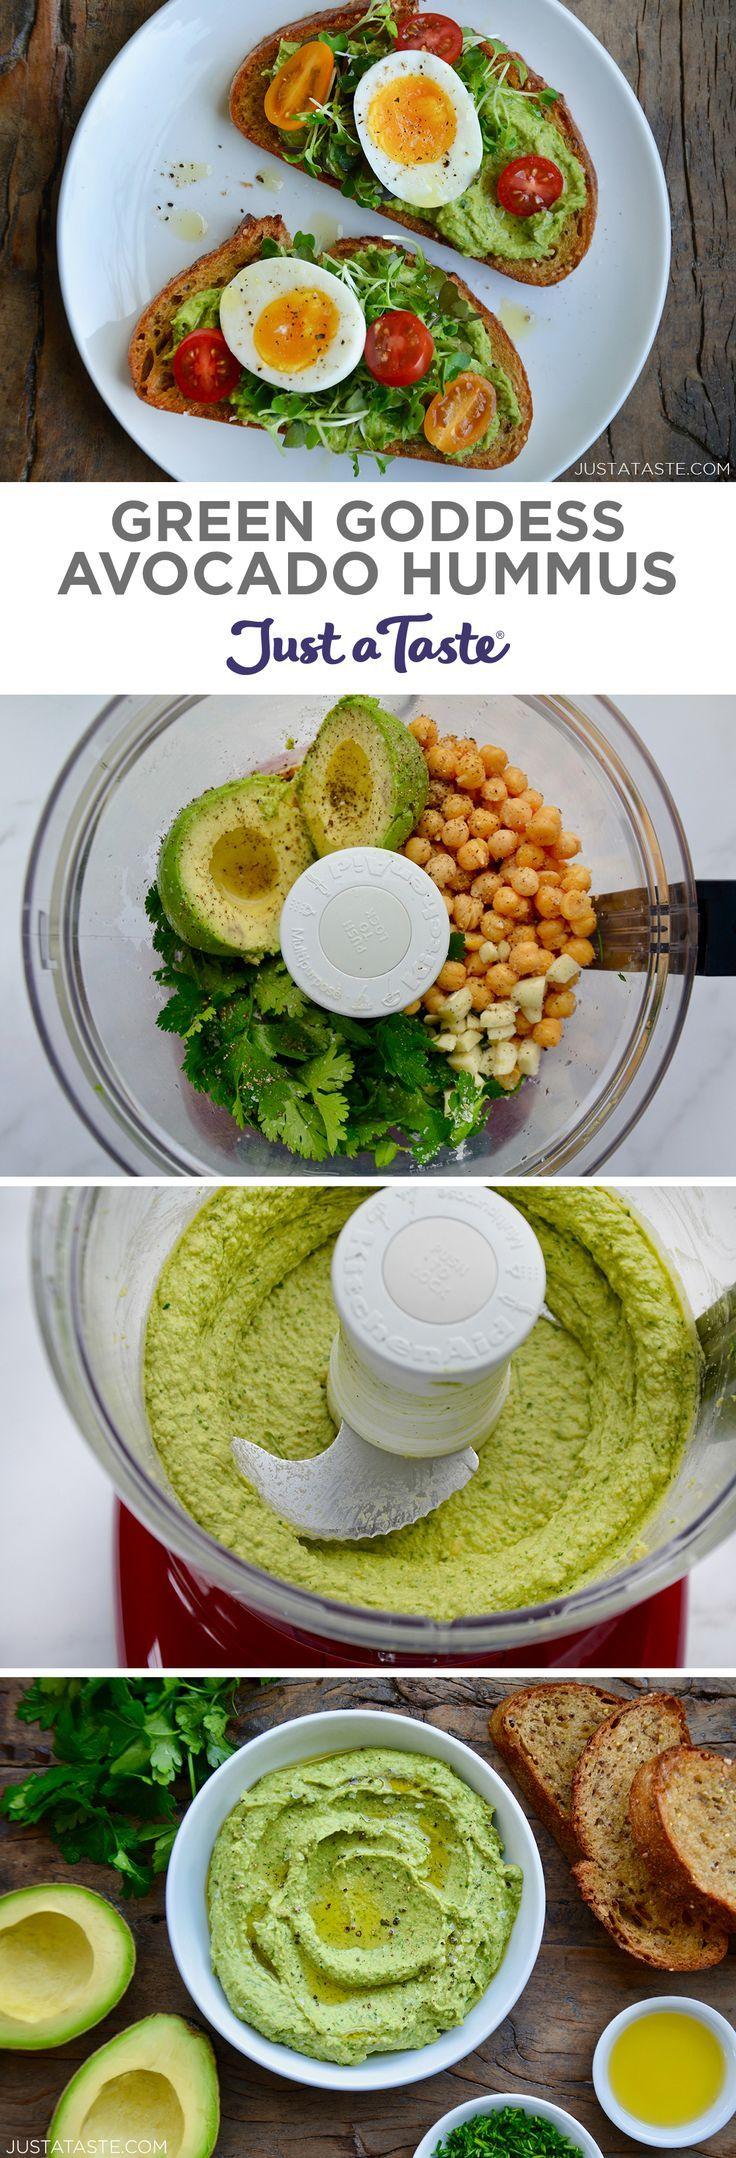 Green Goddess Avocado Hummus Recipe What do you get when you cross a bowl of guacamole with a garde